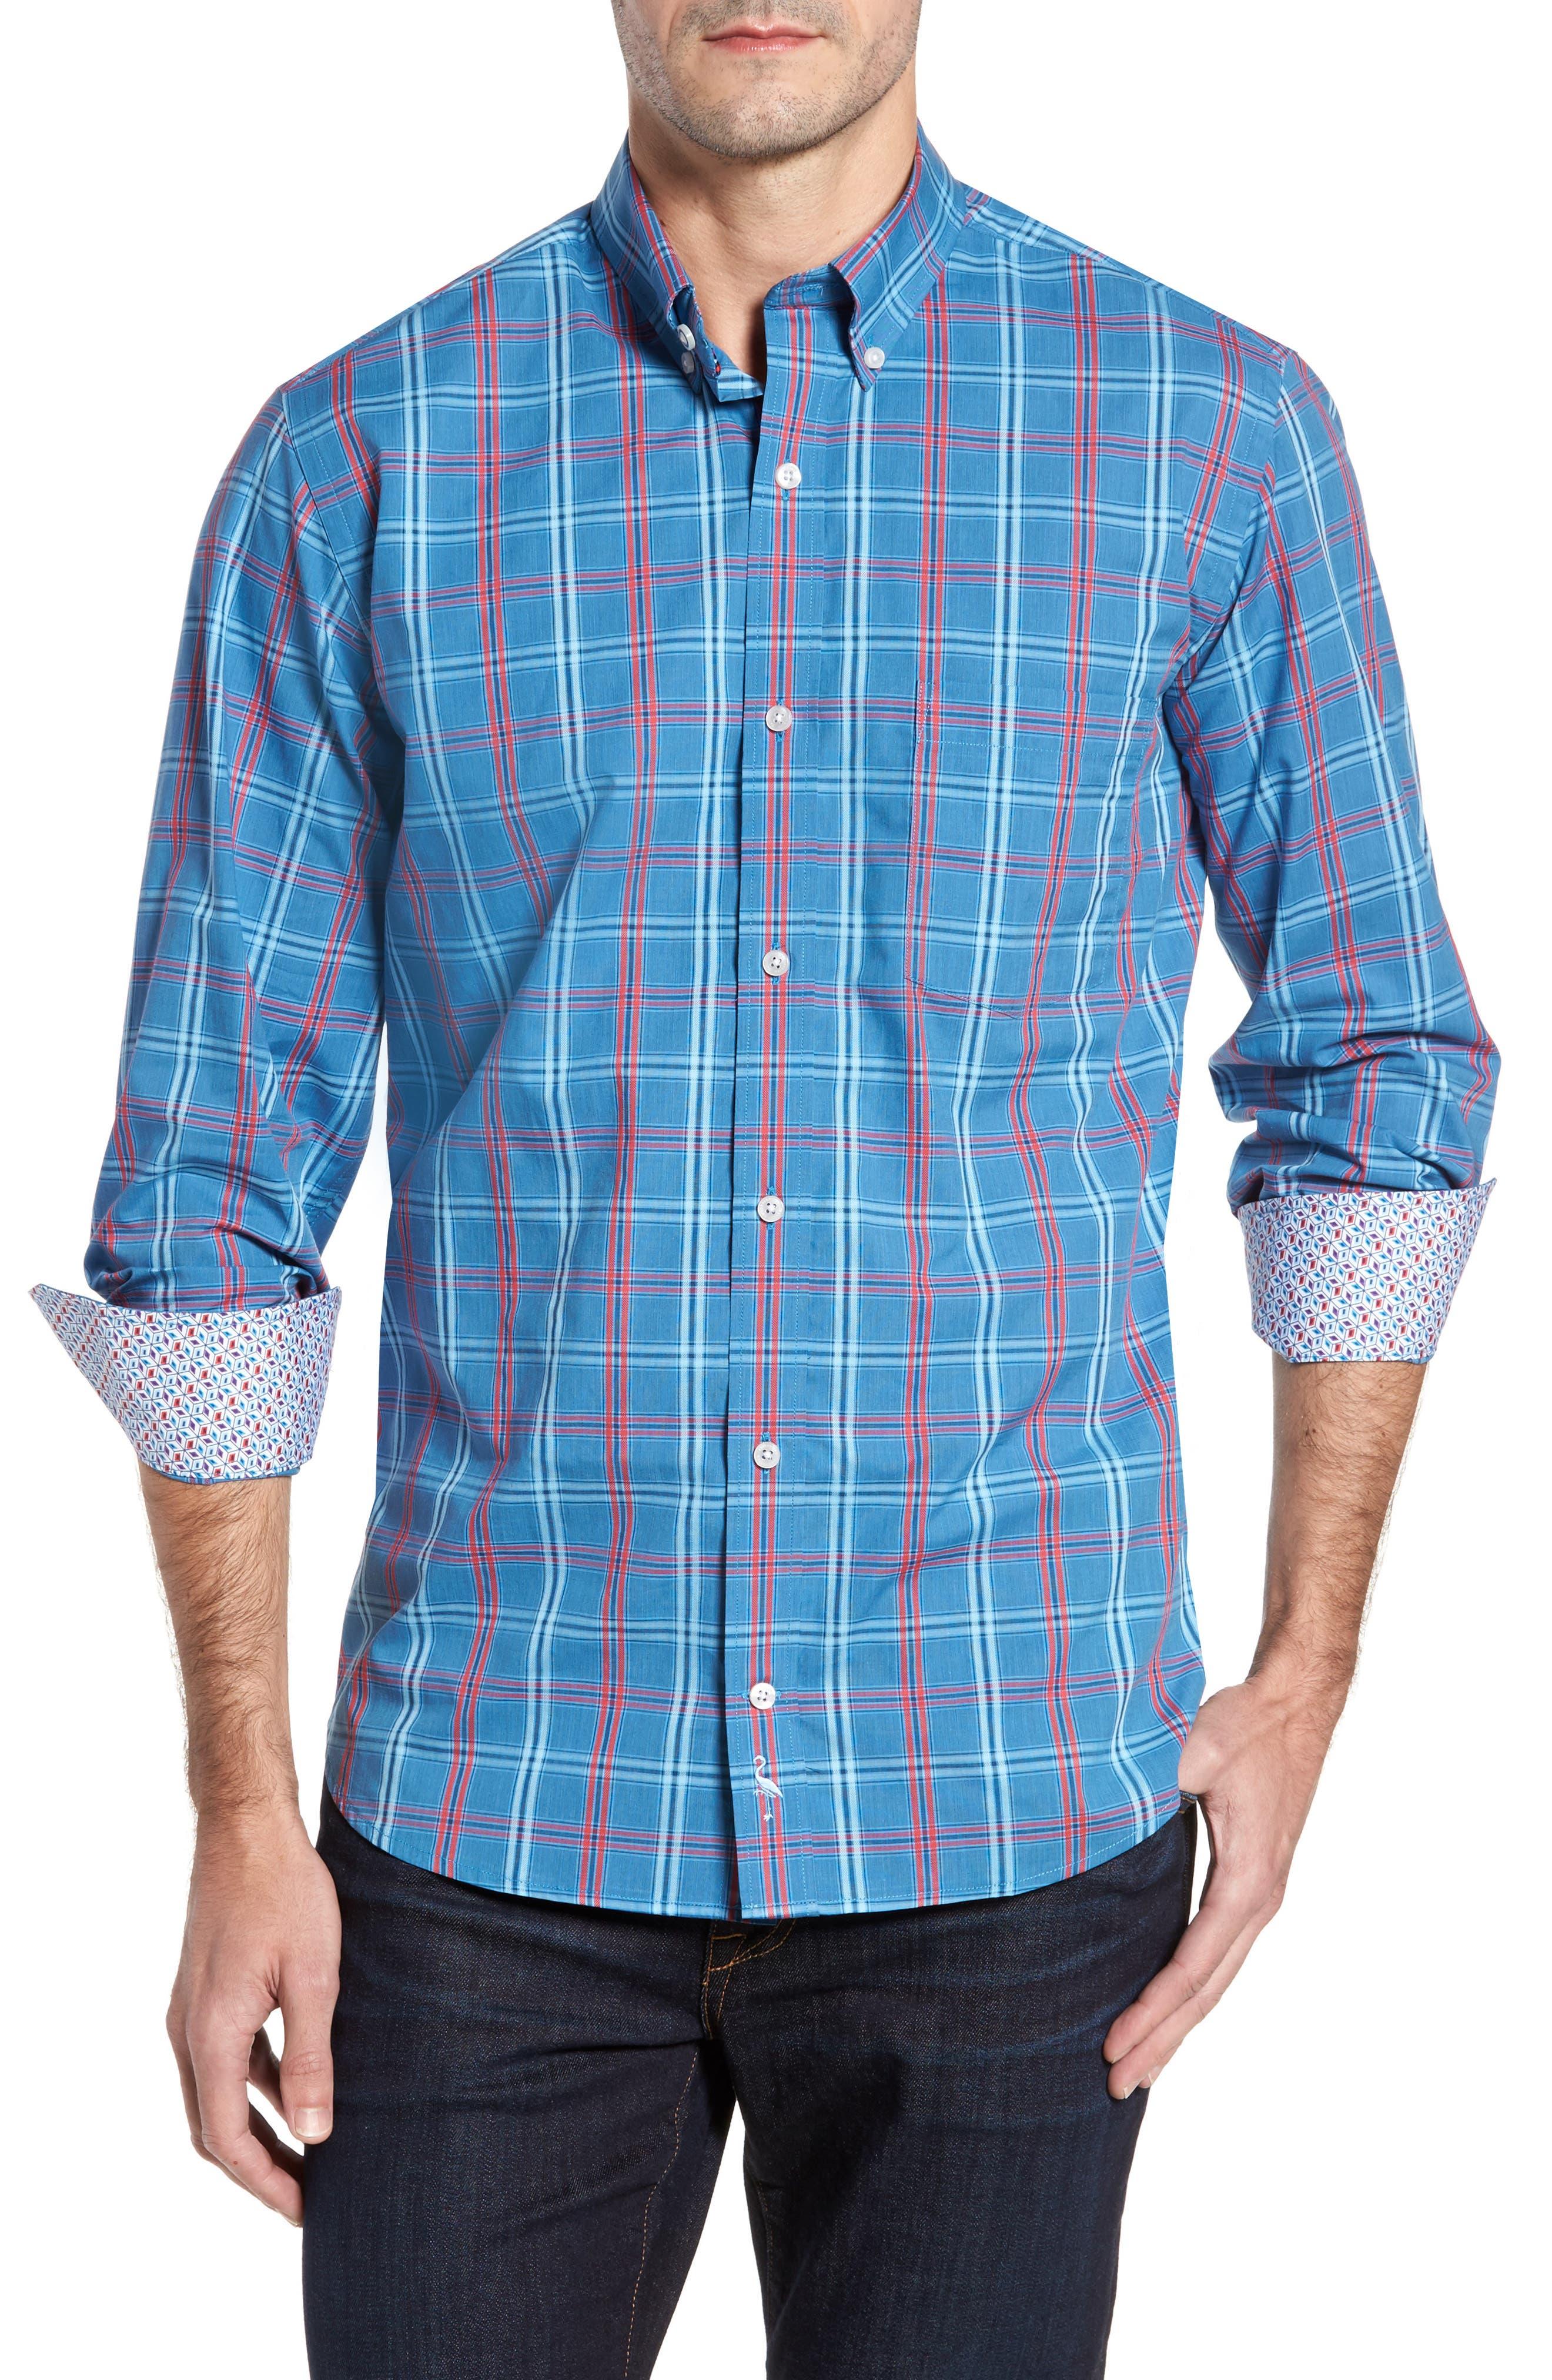 Ashland Windowpane Check Sport Shirt,                         Main,                         color, Blue